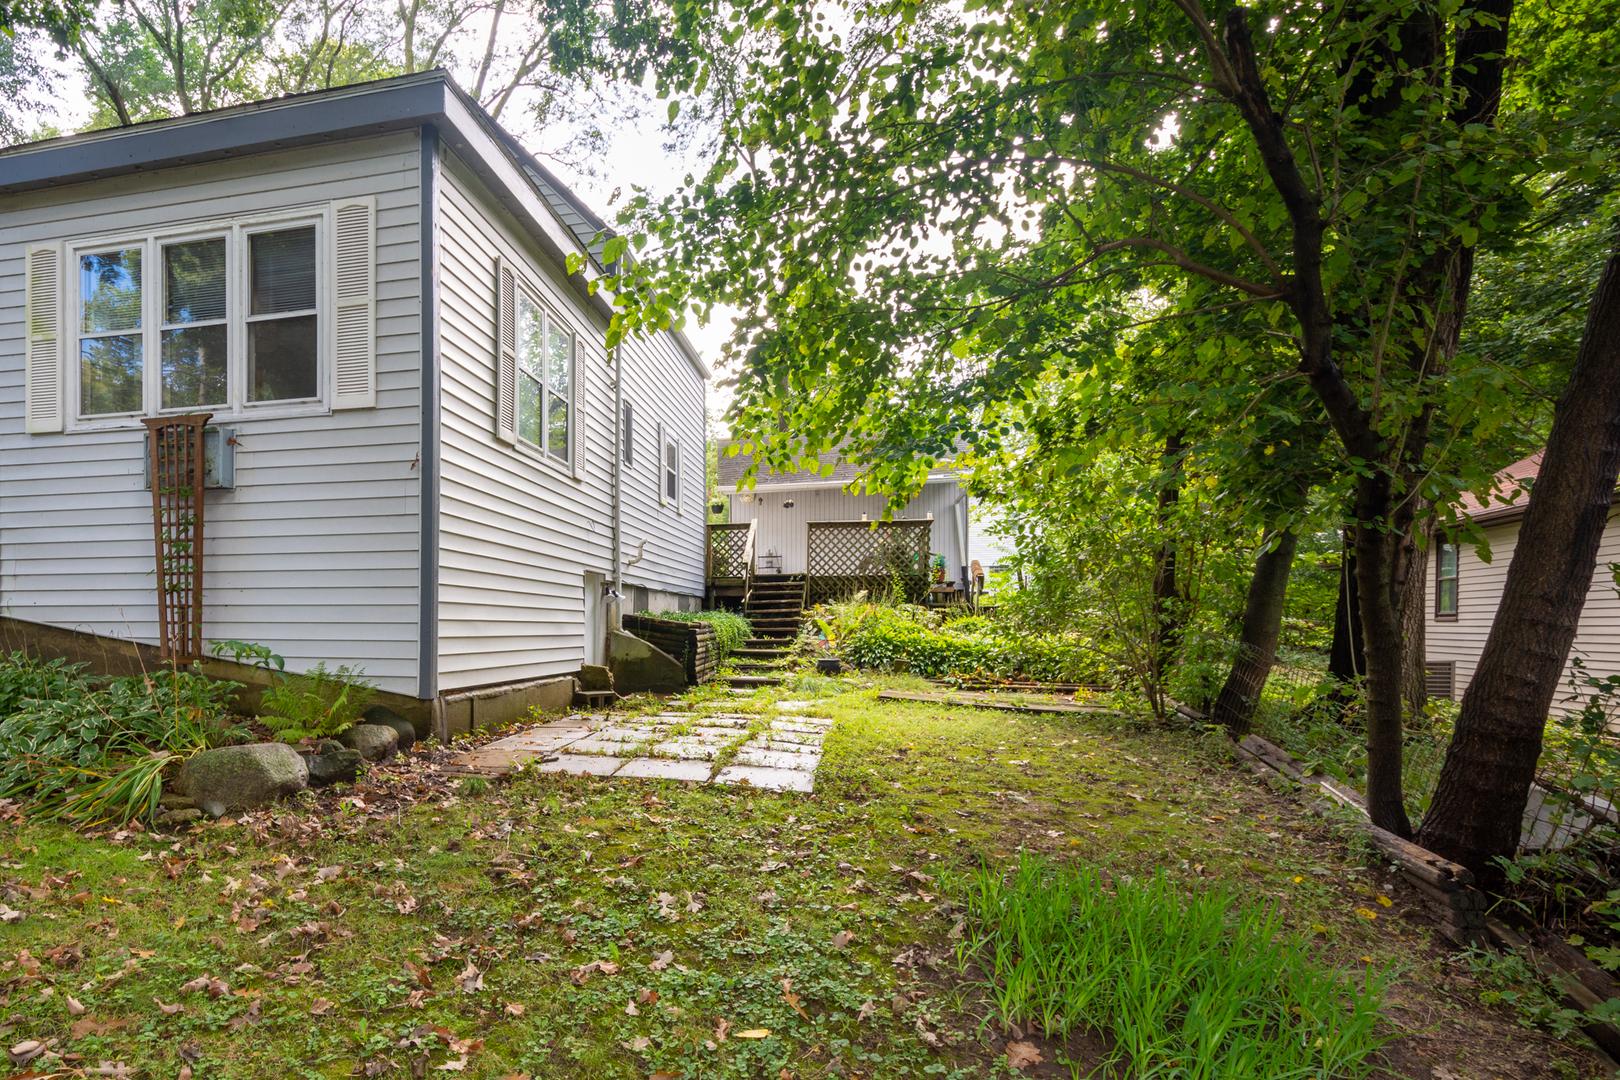 39210 North Jackson, Spring Grove, Illinois, 60081